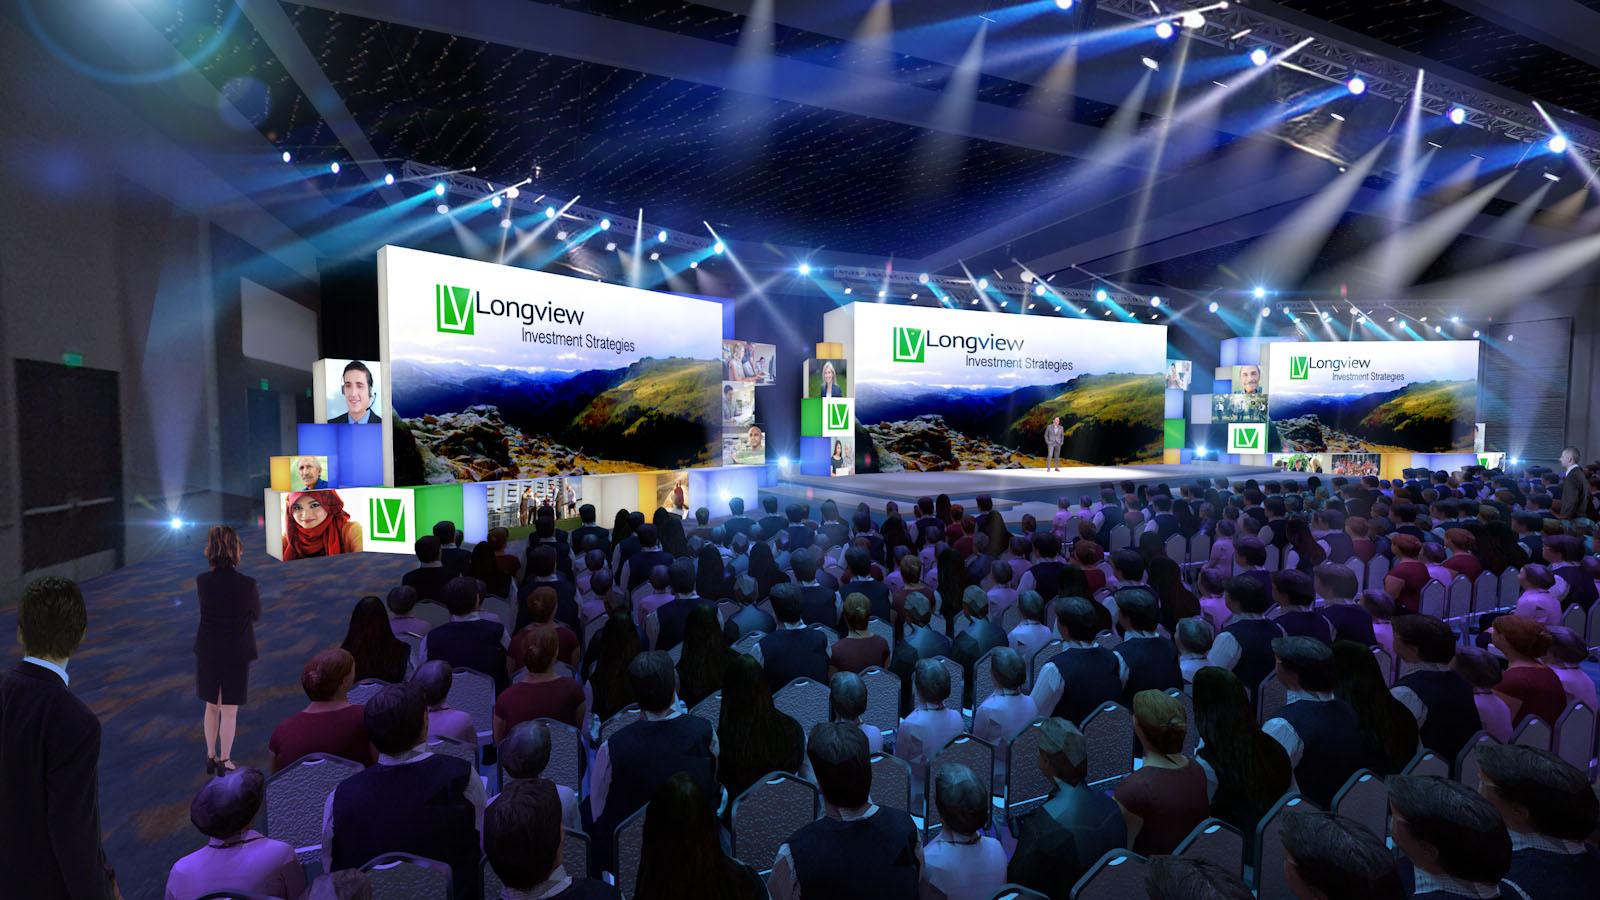 Longview Investment Strategies - Corporate Event